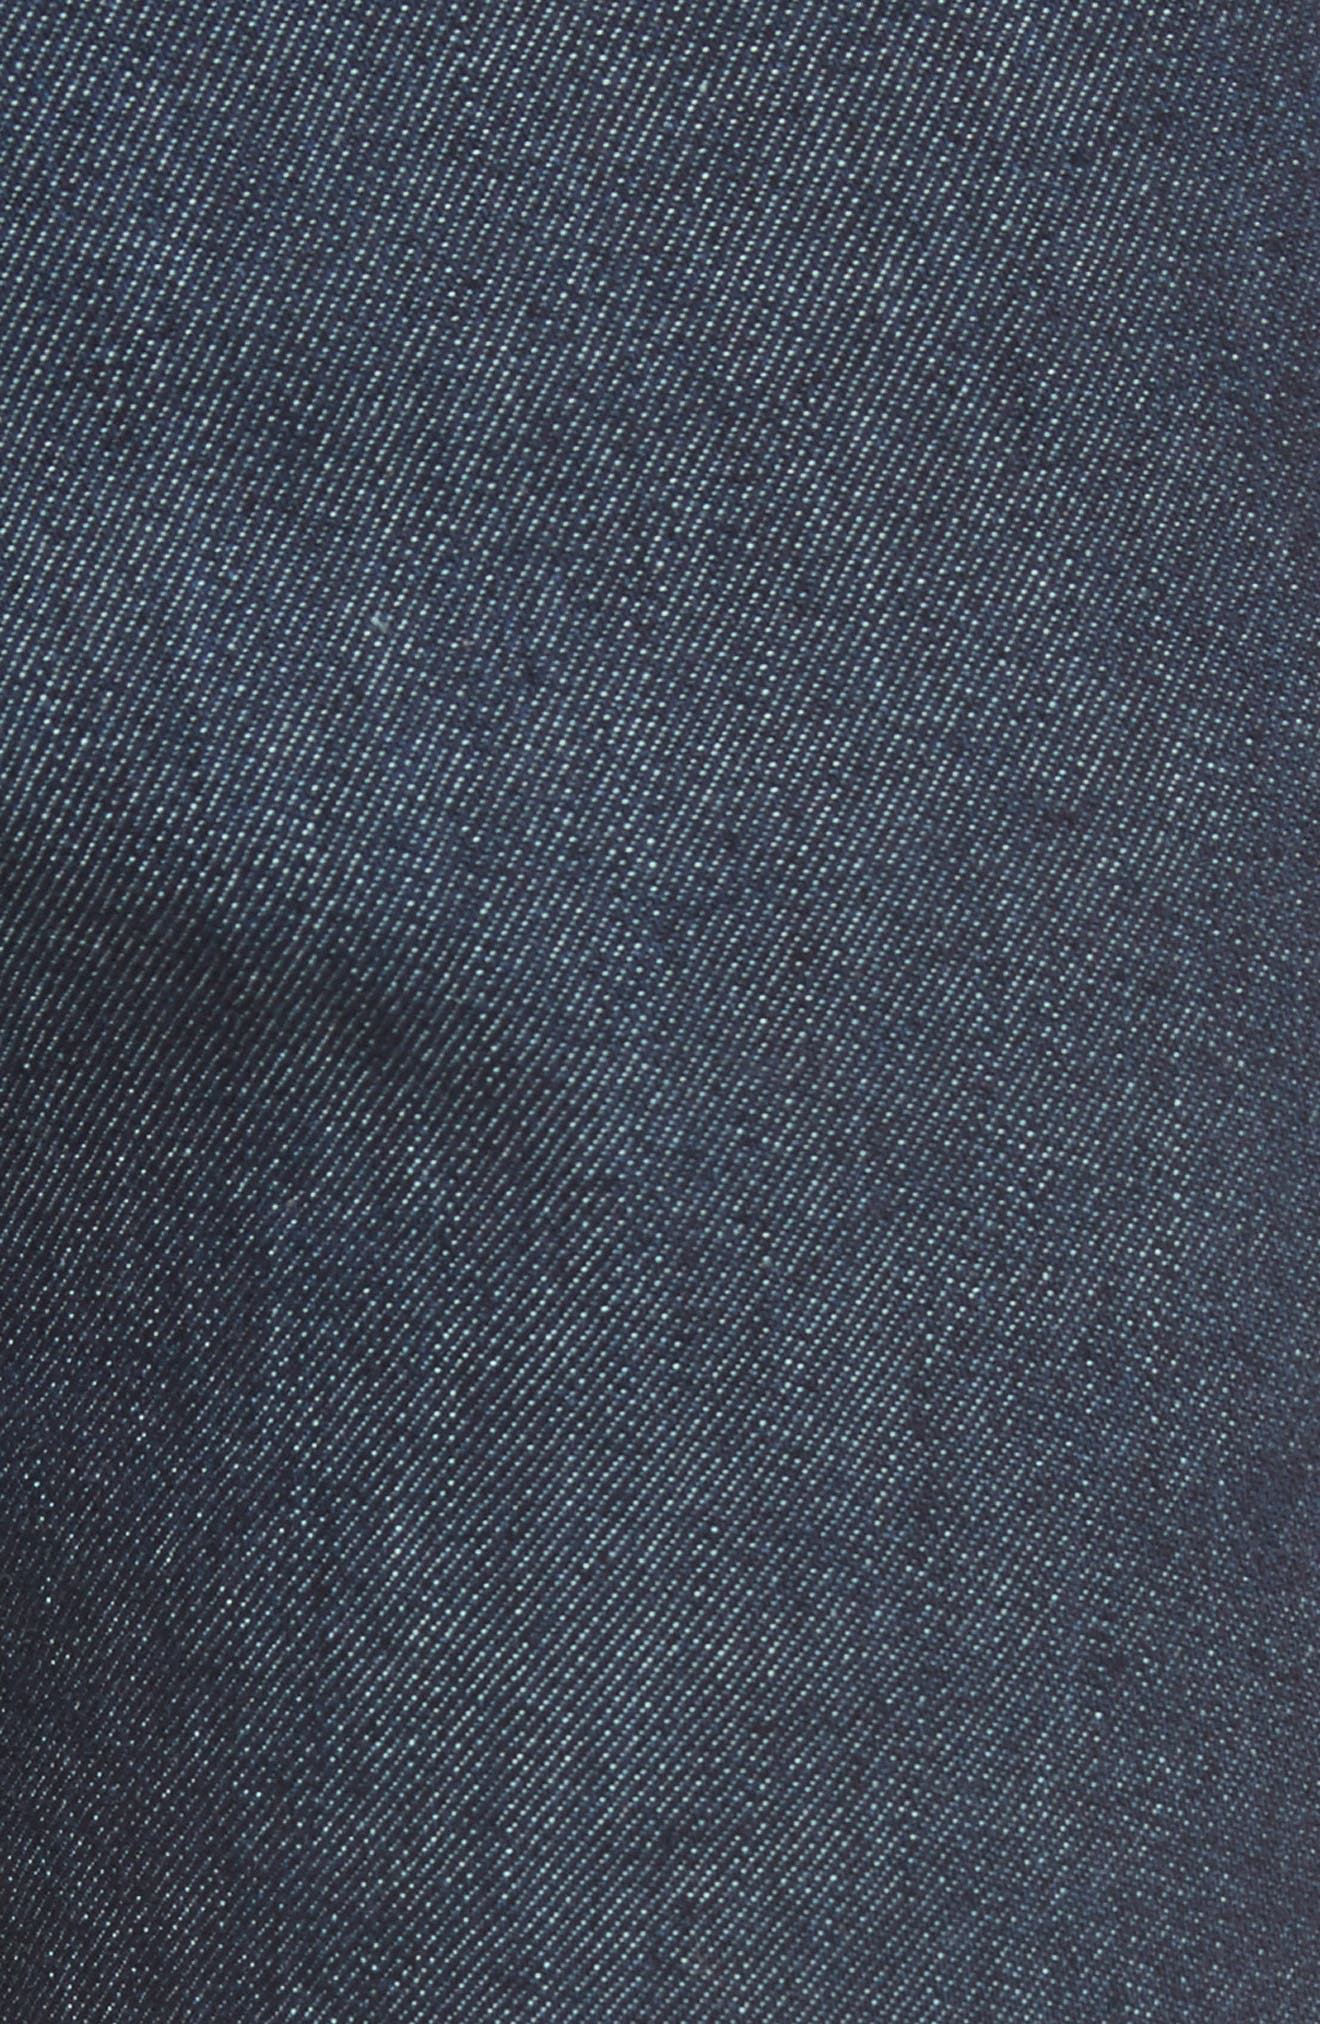 LOEWE, Skinny Fit Jeans, Alternate thumbnail 5, color, BLUE DENIM